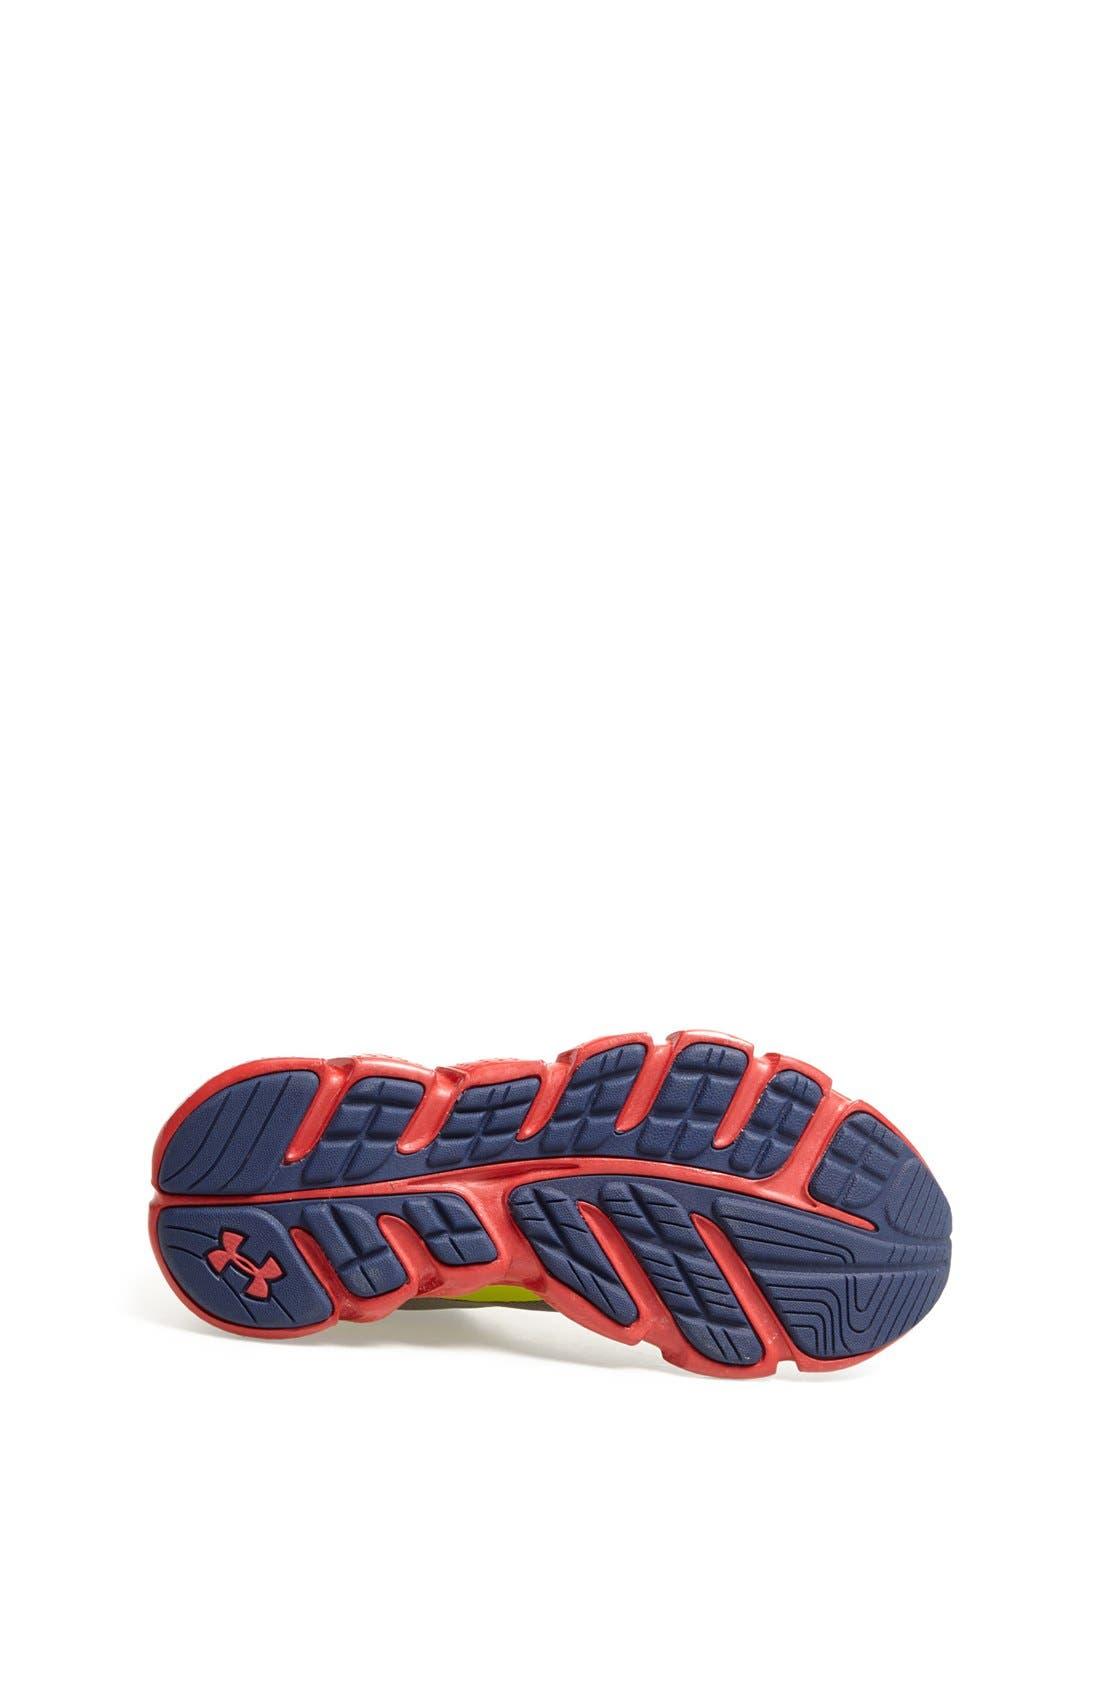 Alternate Image 4  - Under Armour 'Micro G® Pulse' Training Shoe (Toddler, Little Kid & Big Kid)